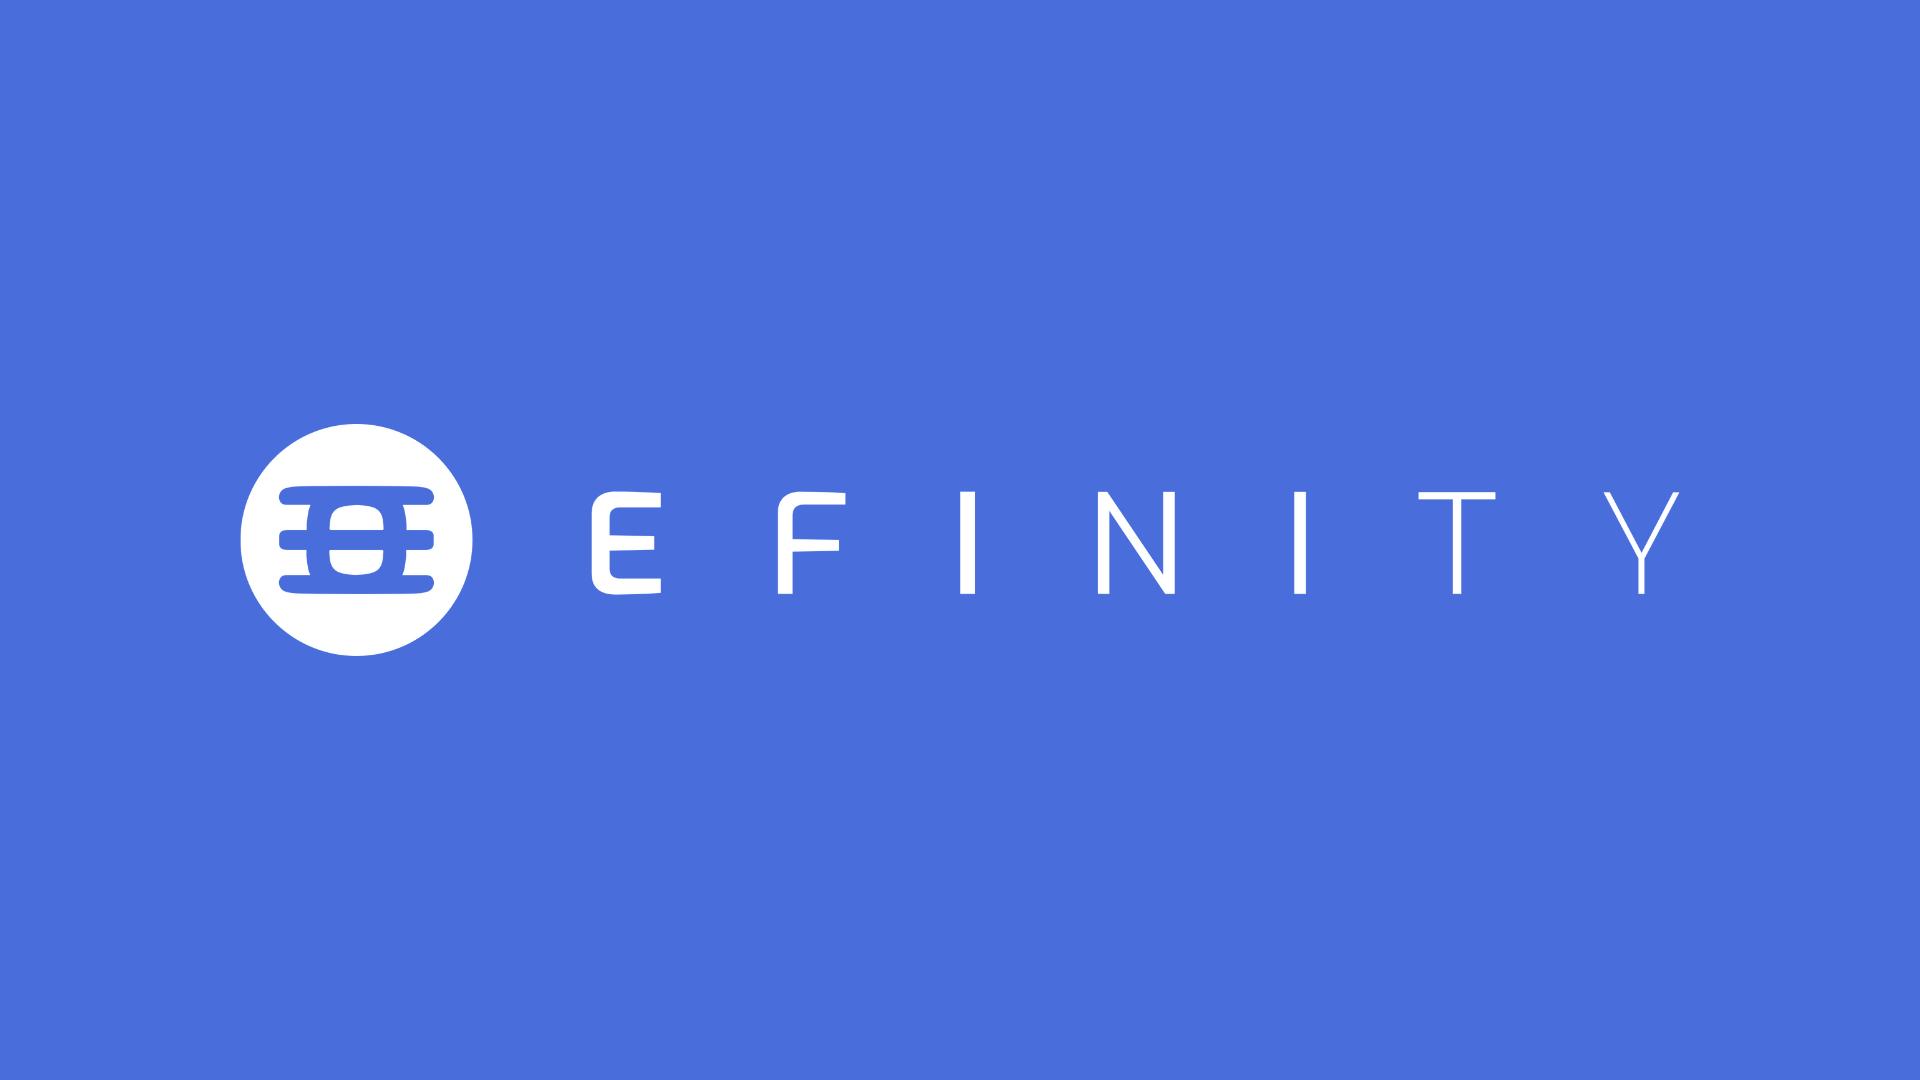 Press Release: Enjin Sells $20M EFI Through CoinList Sale, Bringing Total Value Sold to $38.9M for Efinity | Enjin